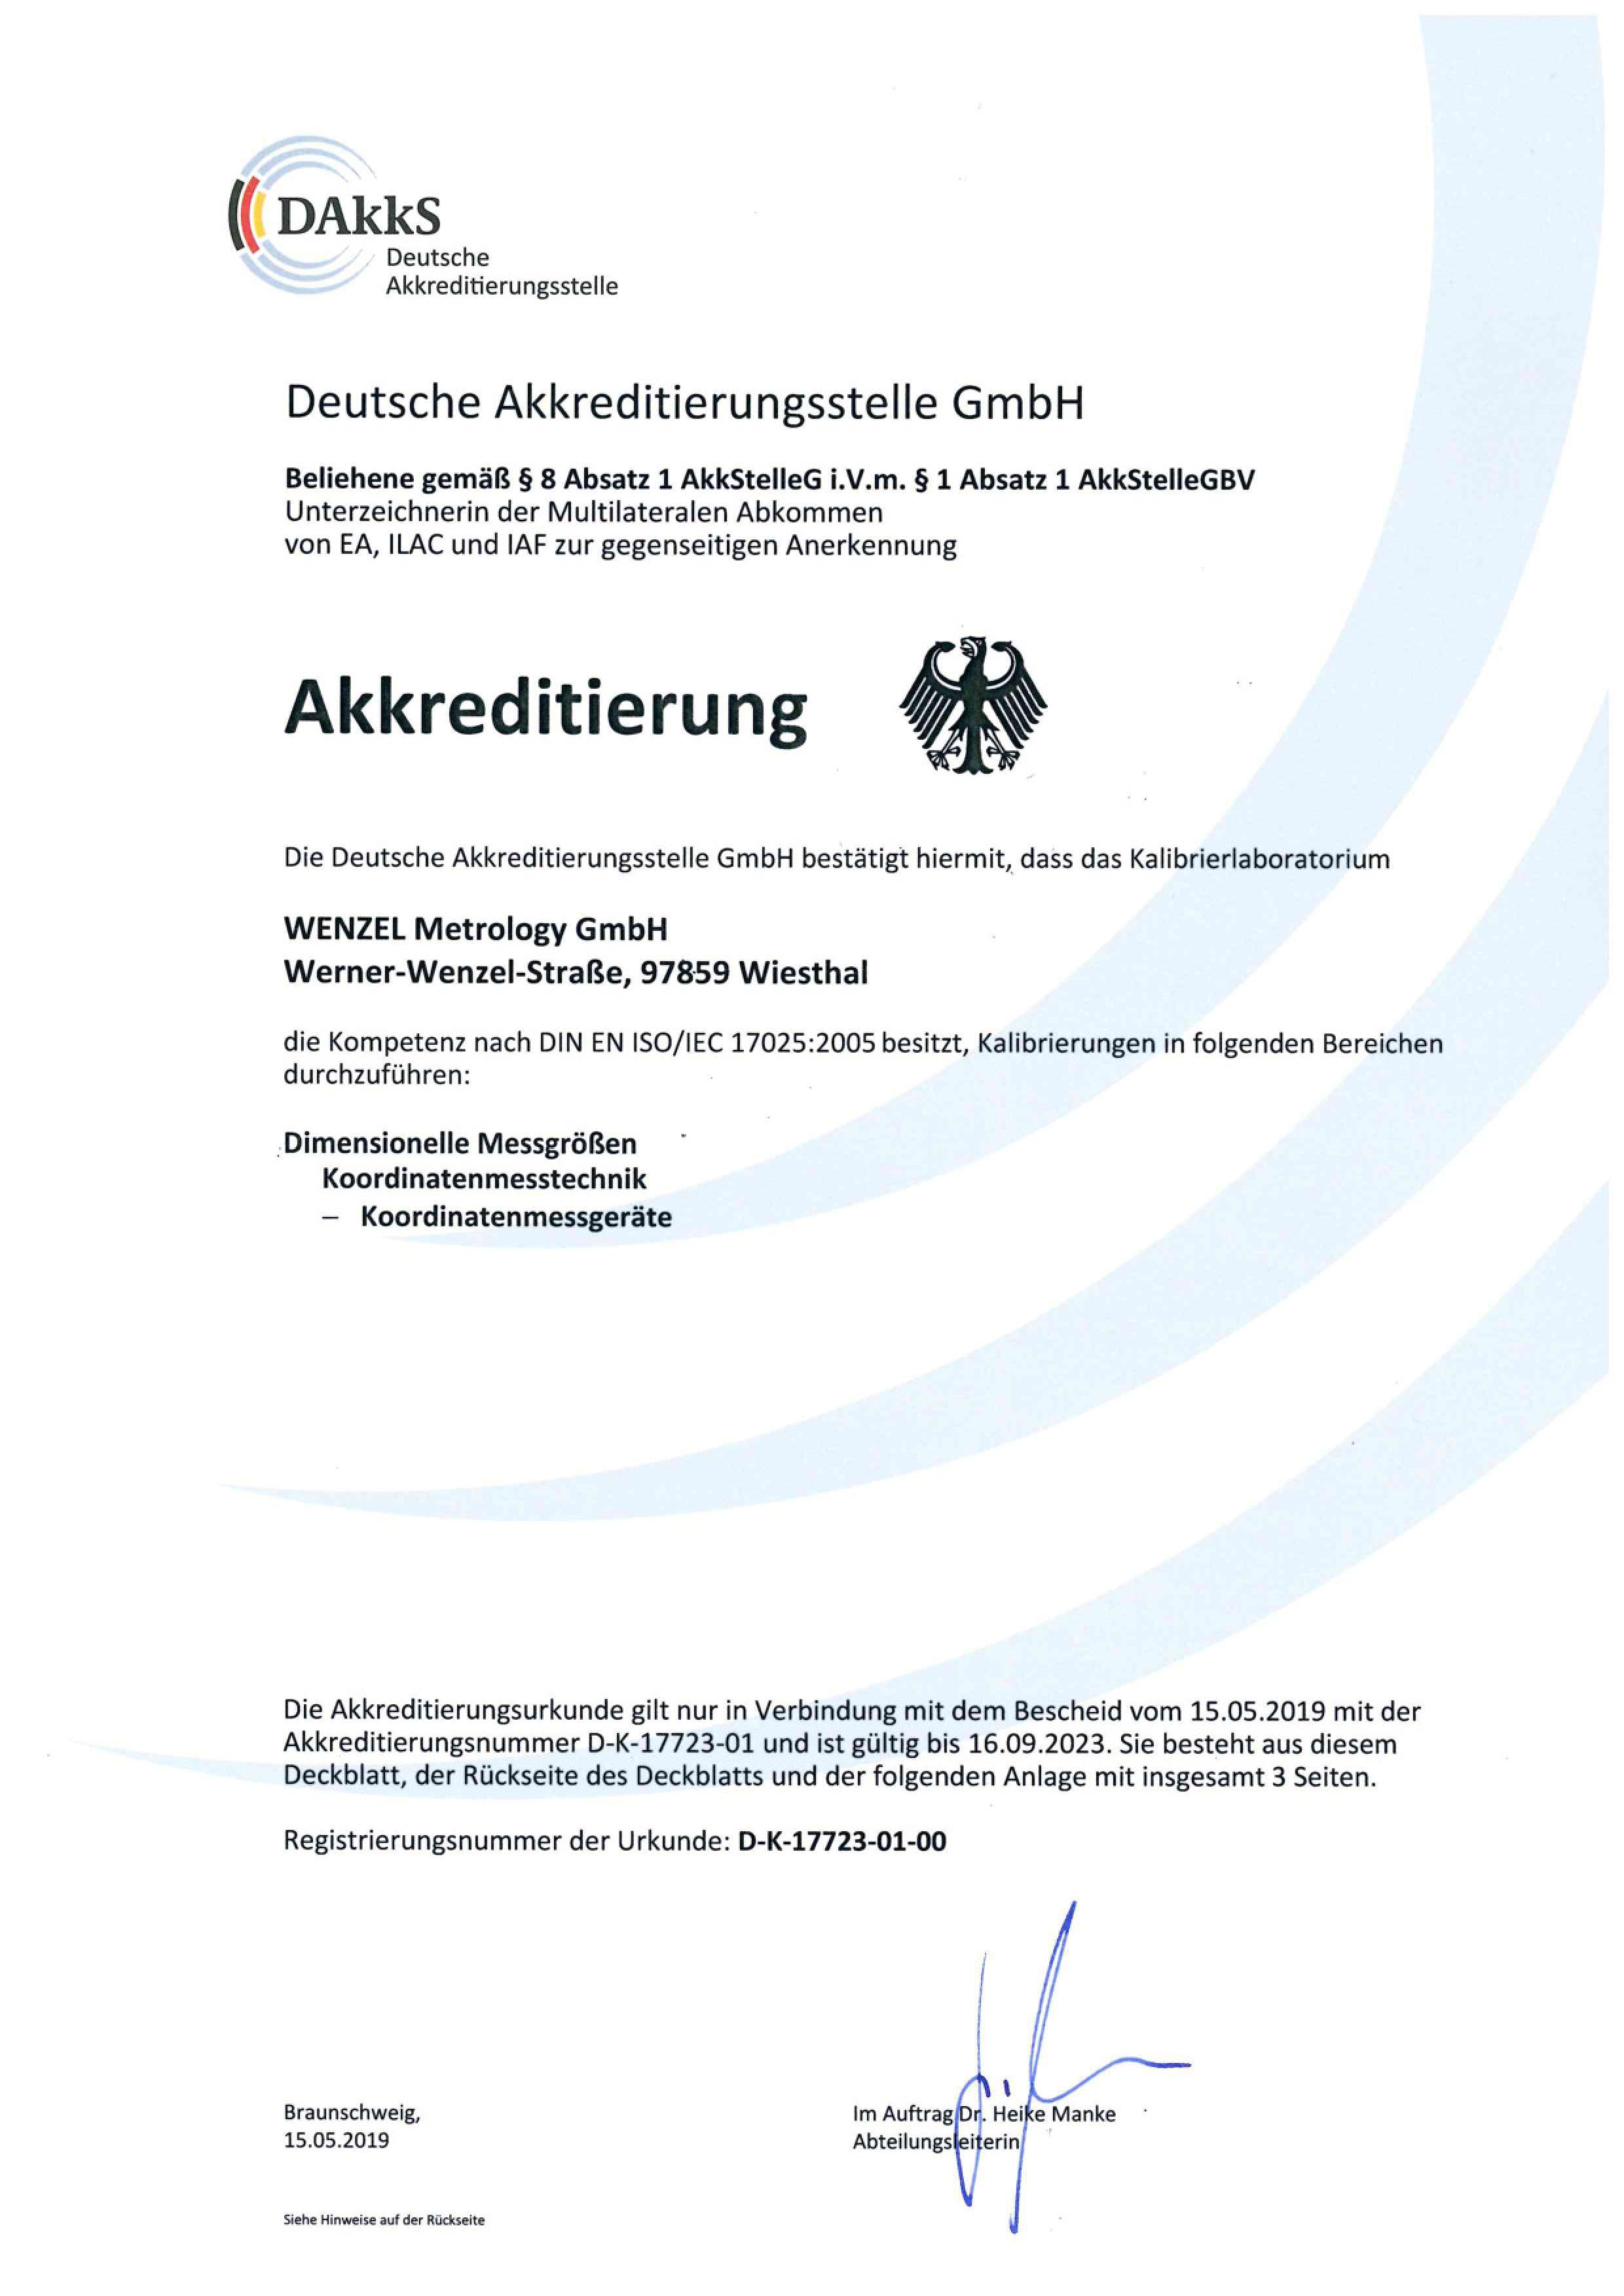 Akkreditierungsurkunde_D-K-17723-01-00_15-05.2019-page-001